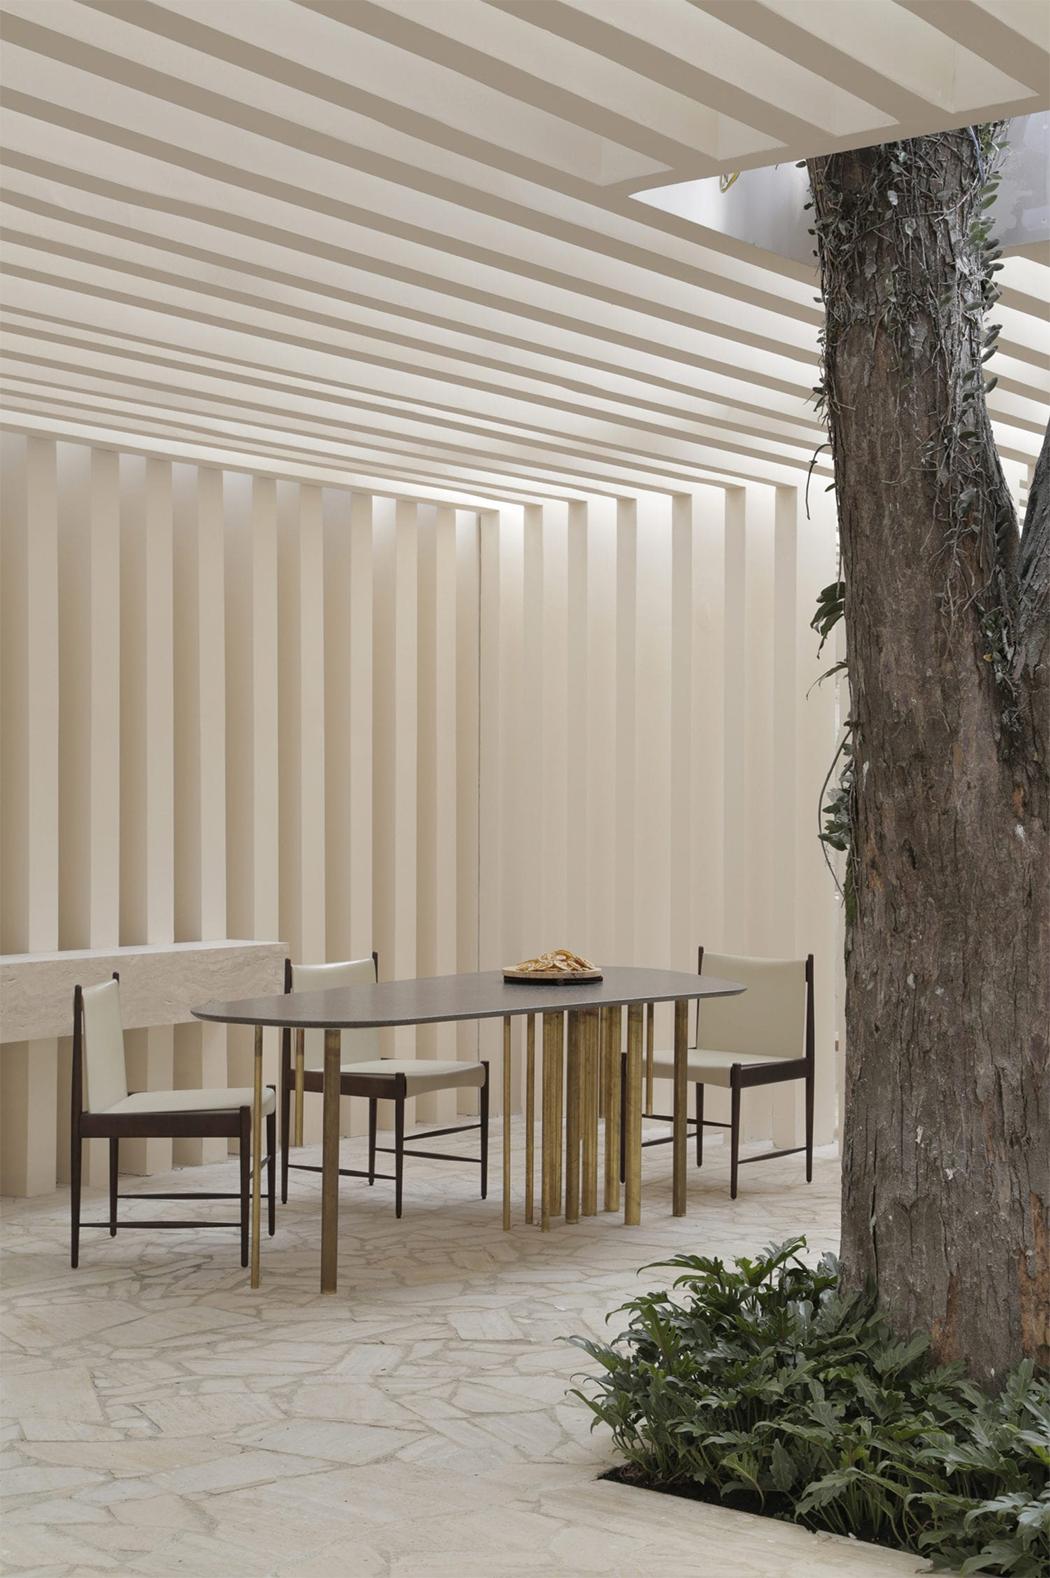 Sibipirunas Concept House in Cidade Jardim ,Brazil 2.png